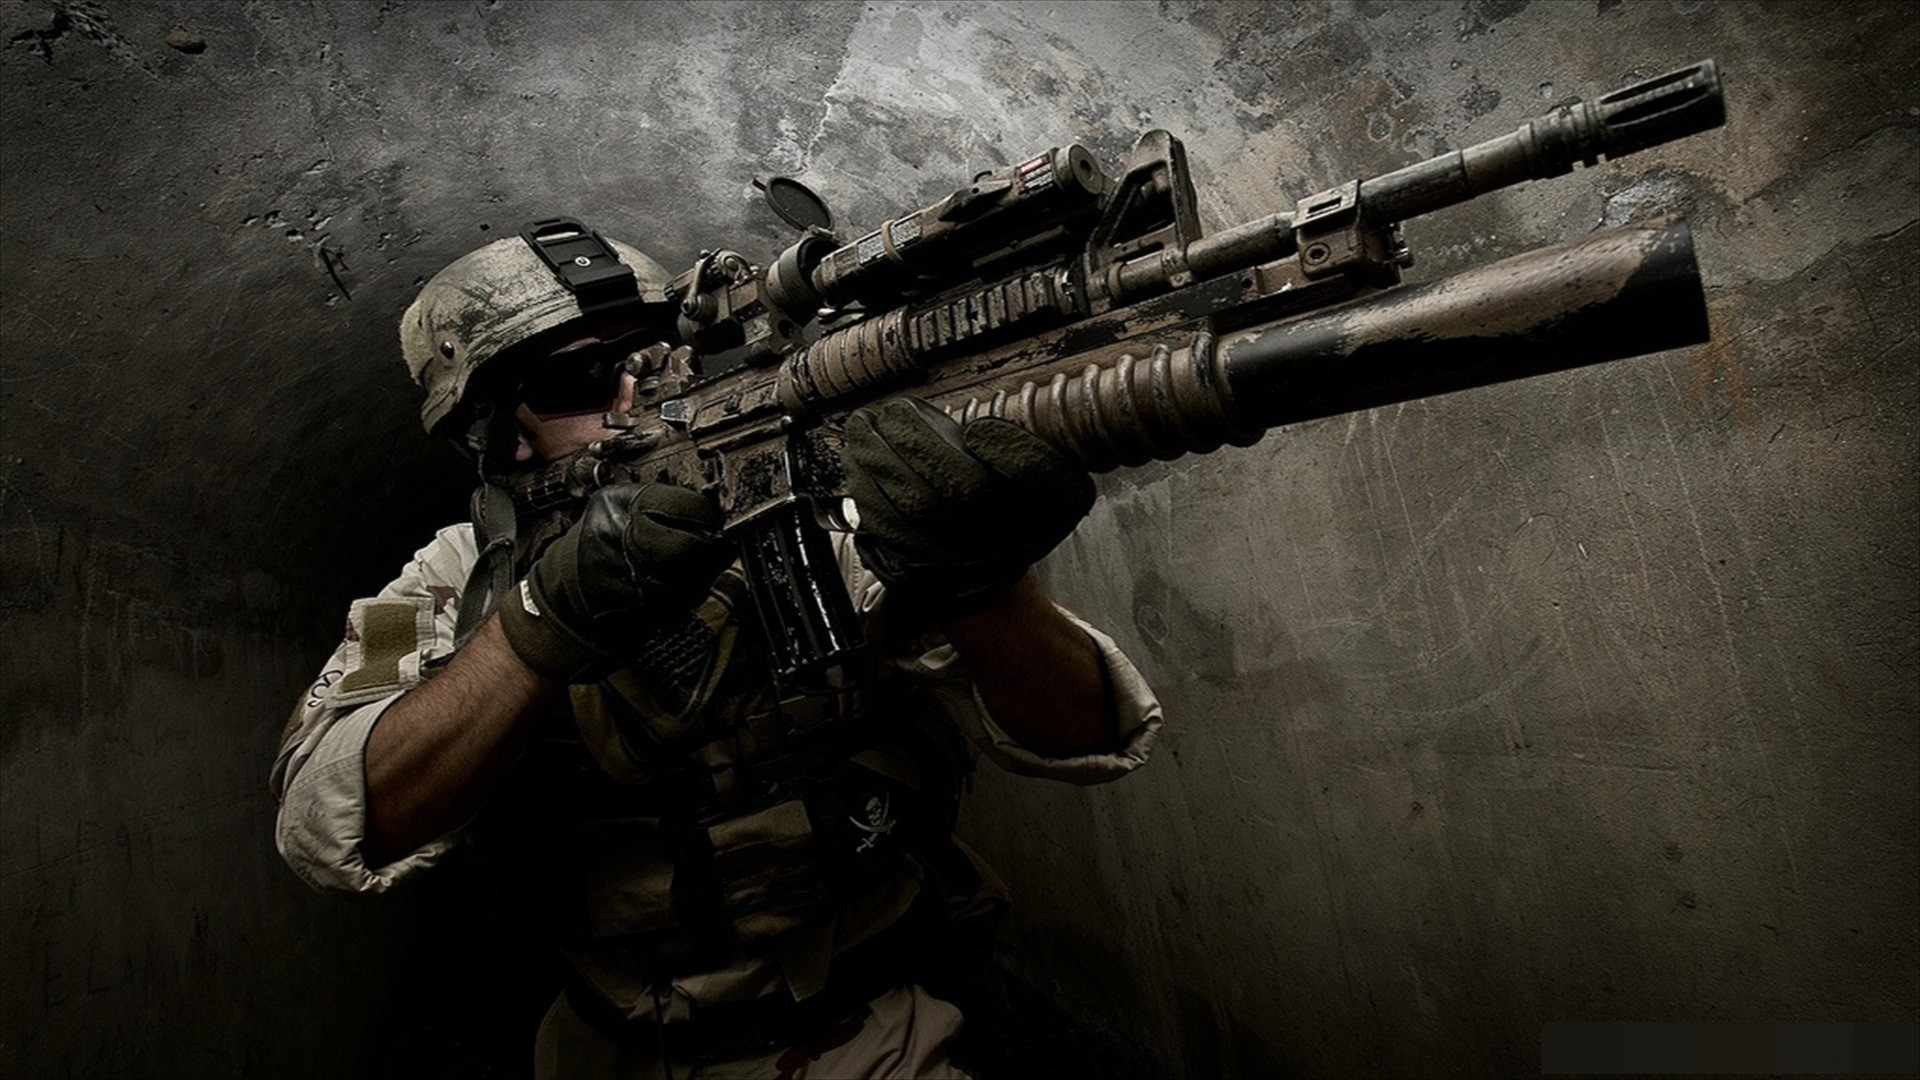 1920x1200 Preview Sniper Wallpaper